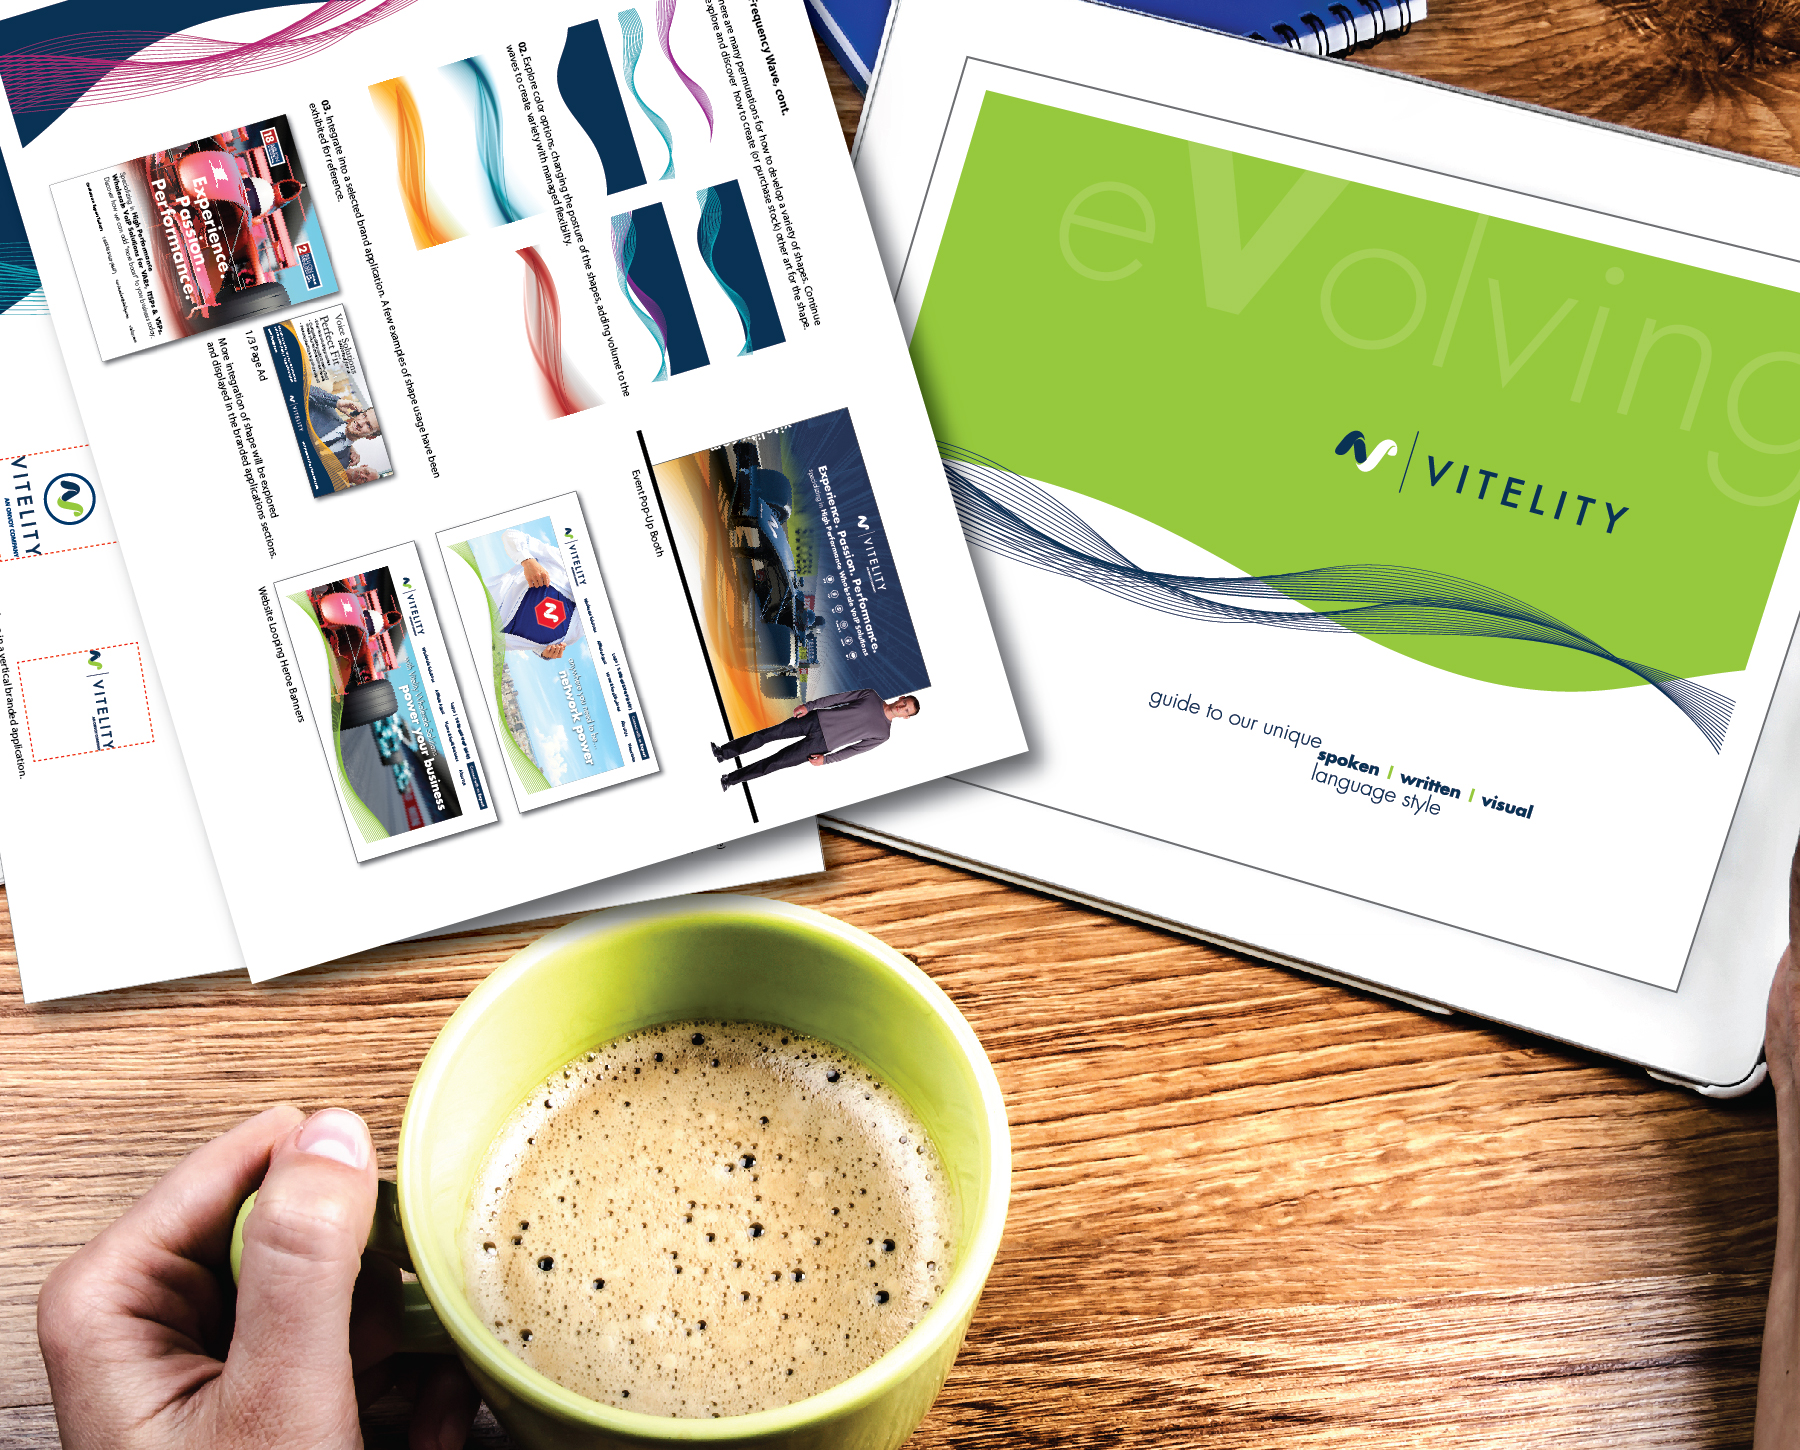 Vitelity, Marketing Client